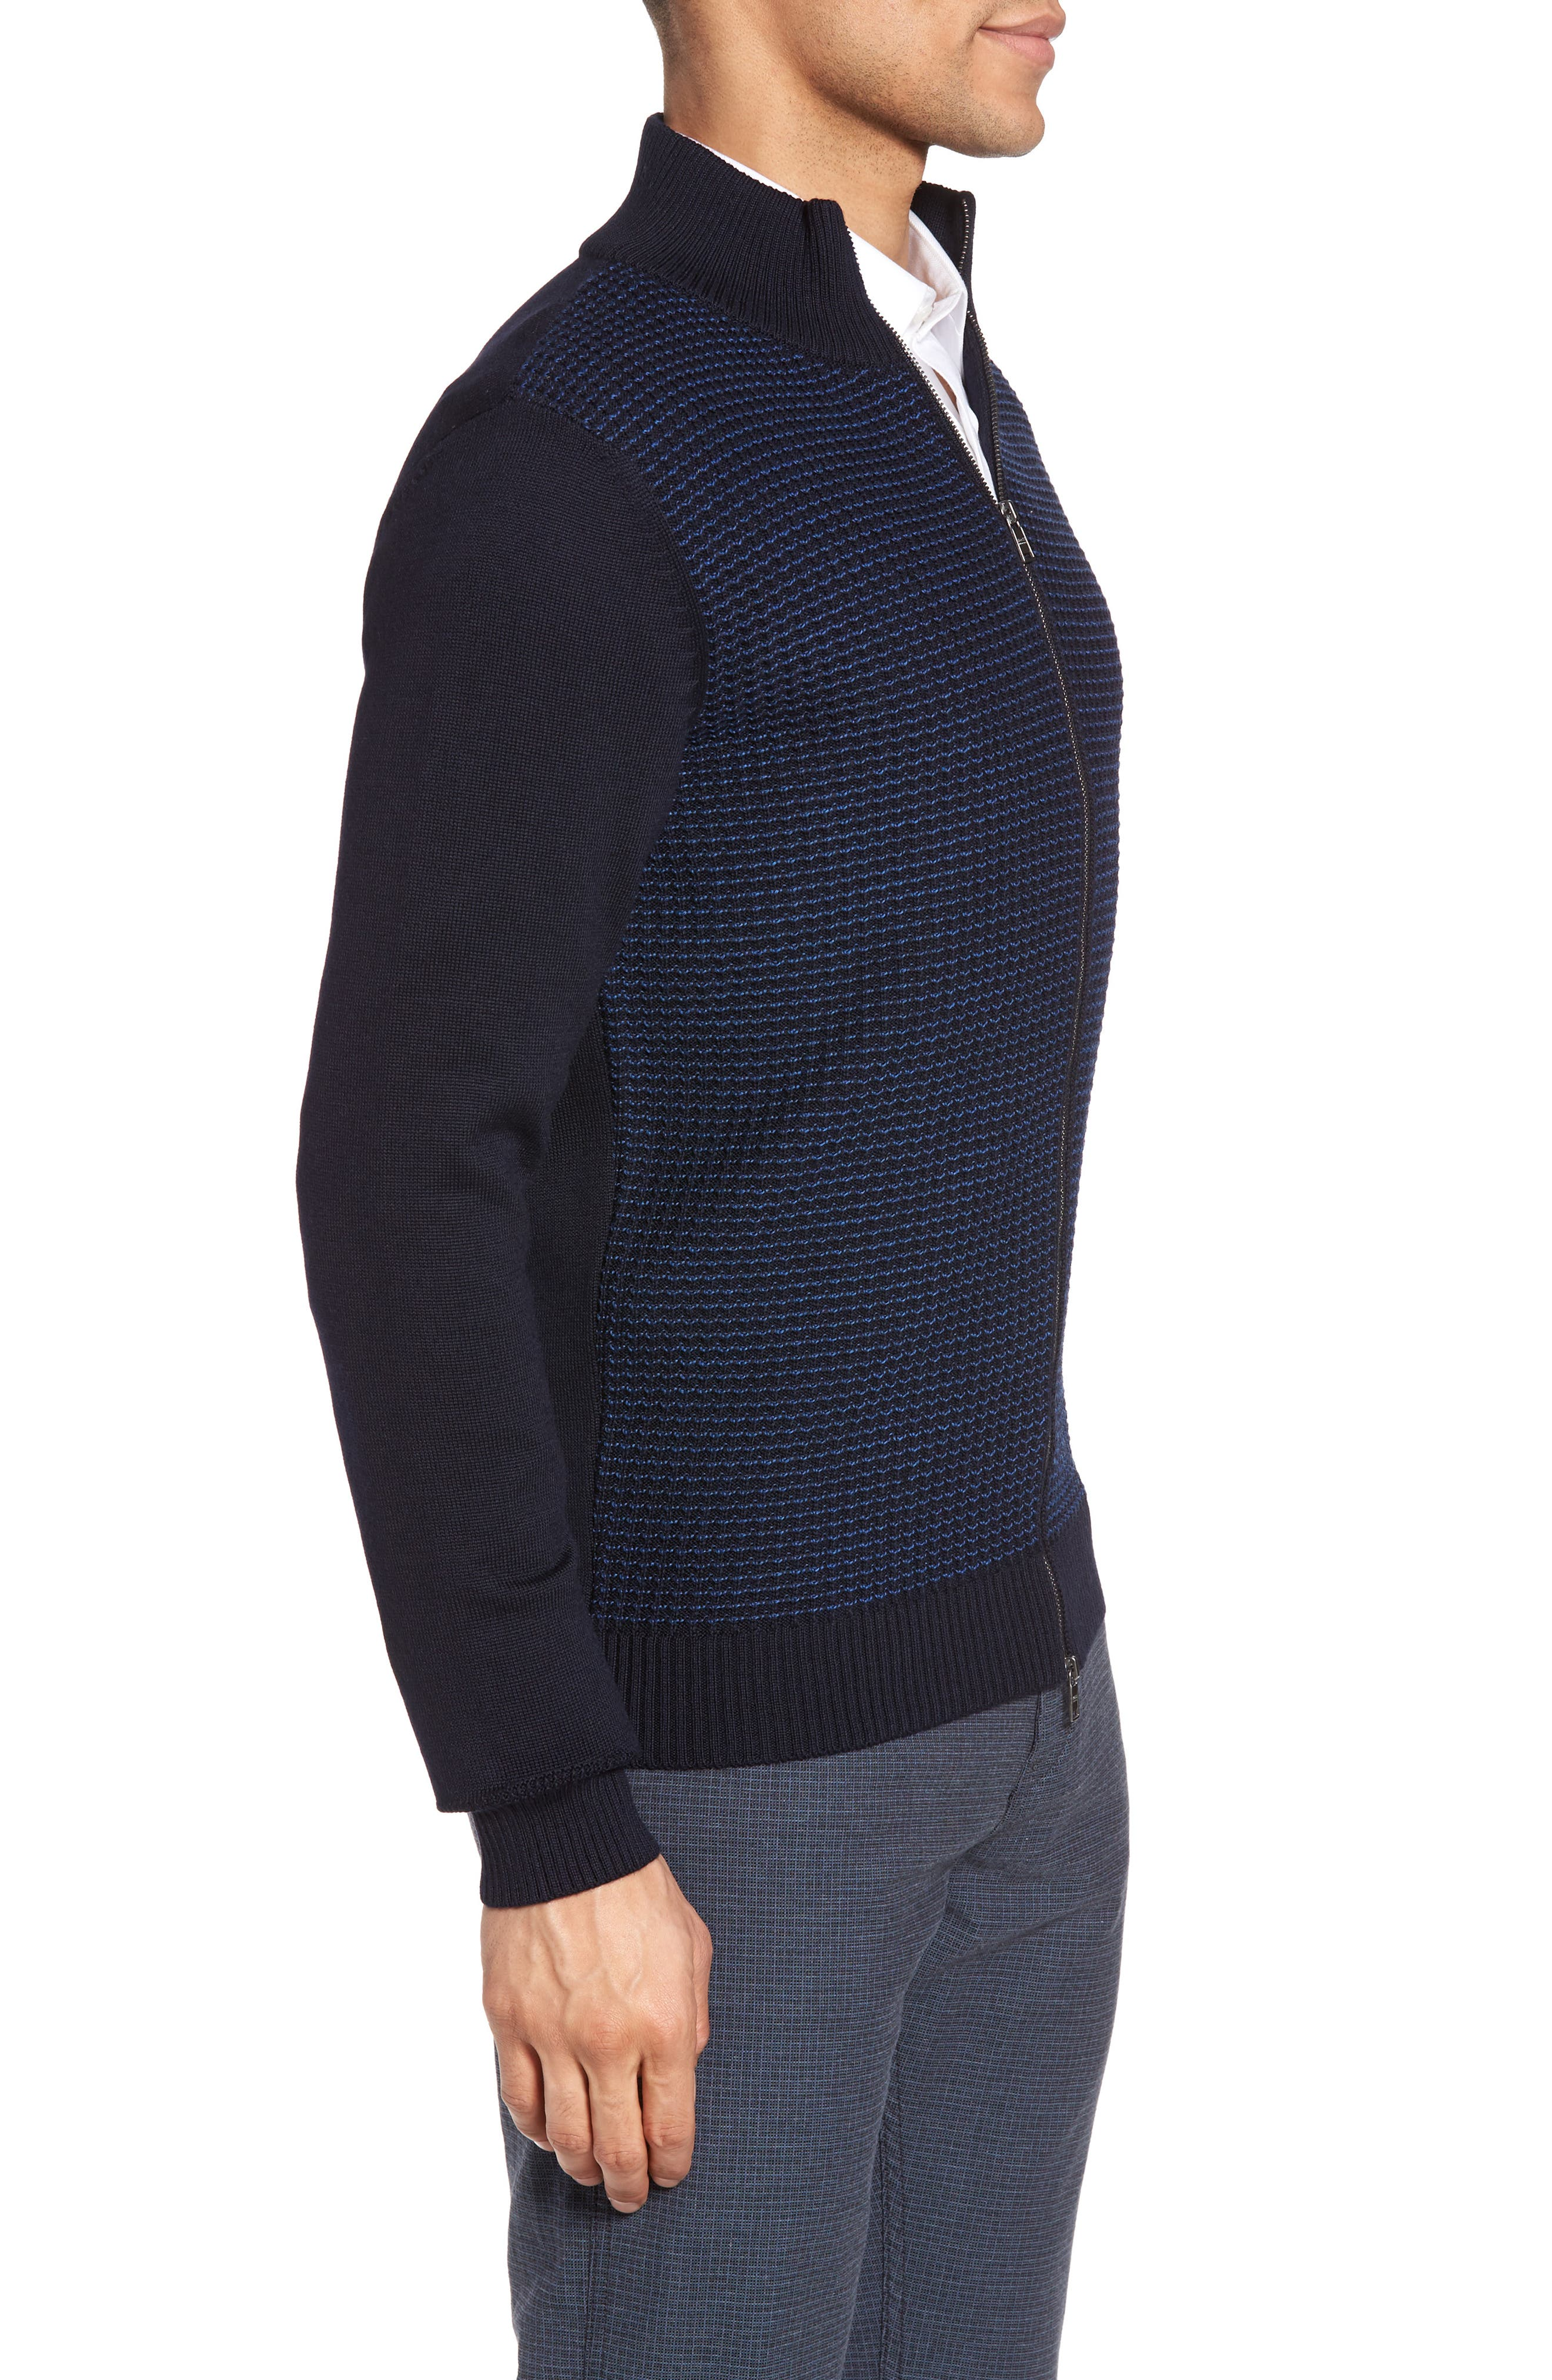 Bacco Full Zip Wool Sweater Jacket,                             Alternate thumbnail 3, color,                             Navy